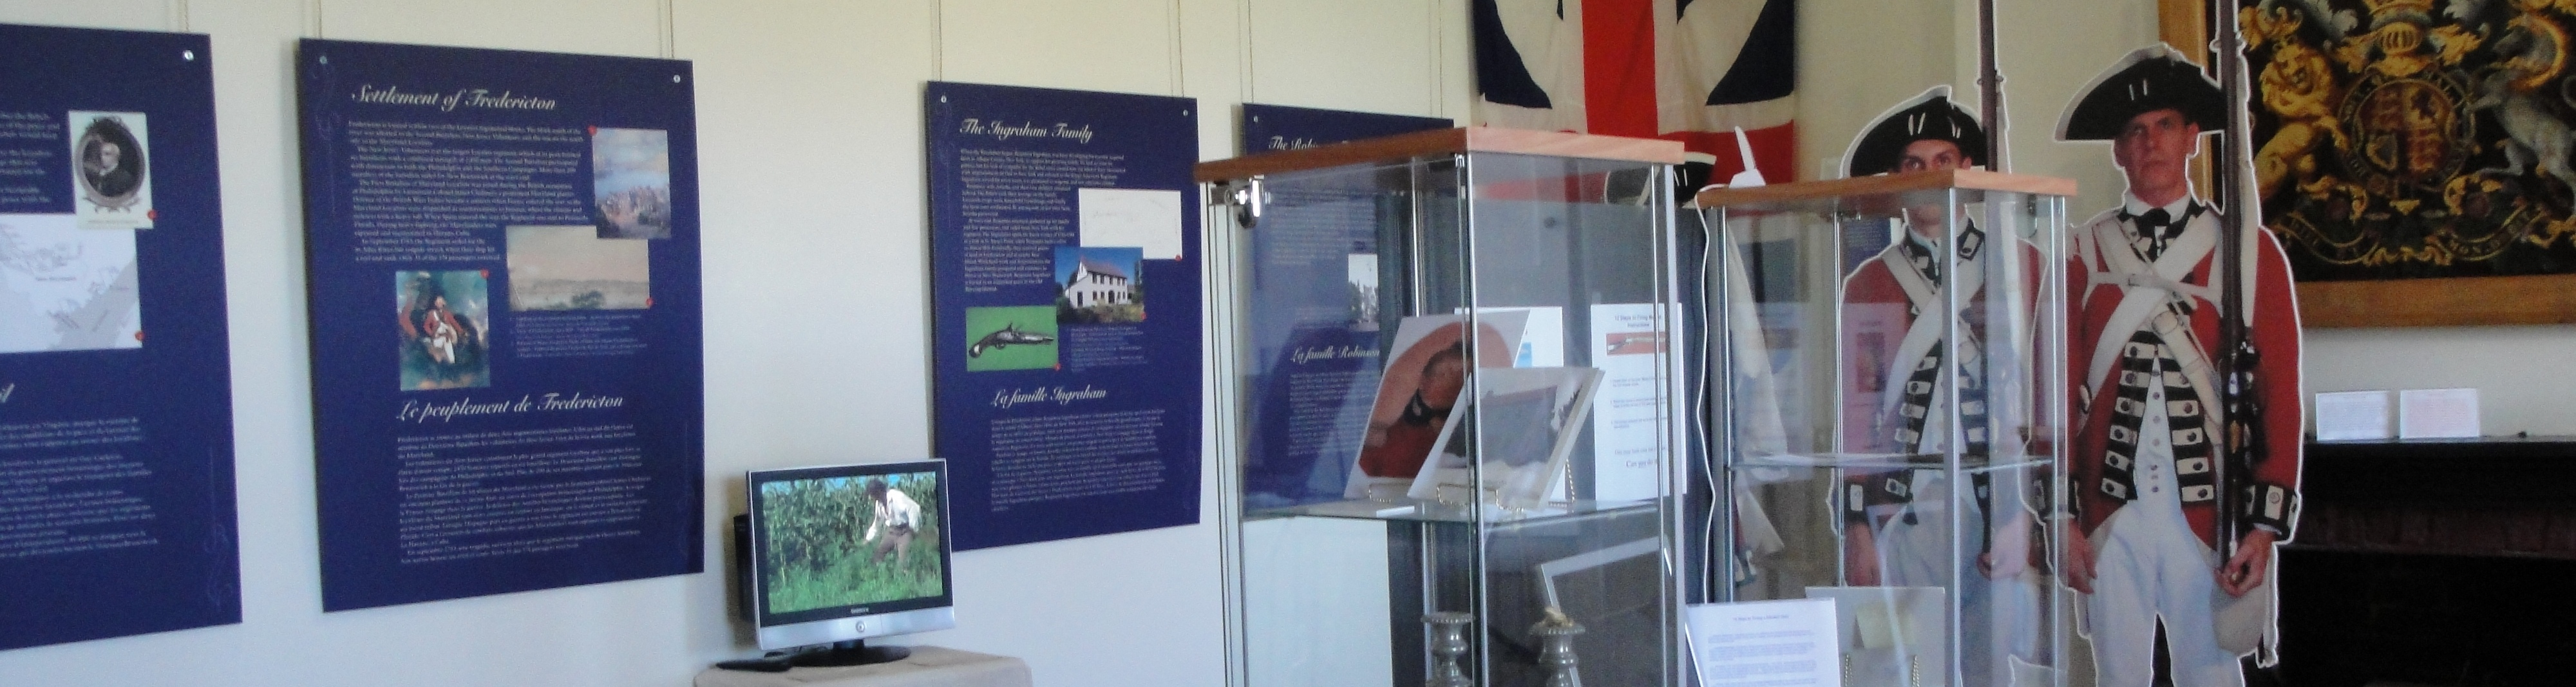 Fredericton's Loyalists Exhibits